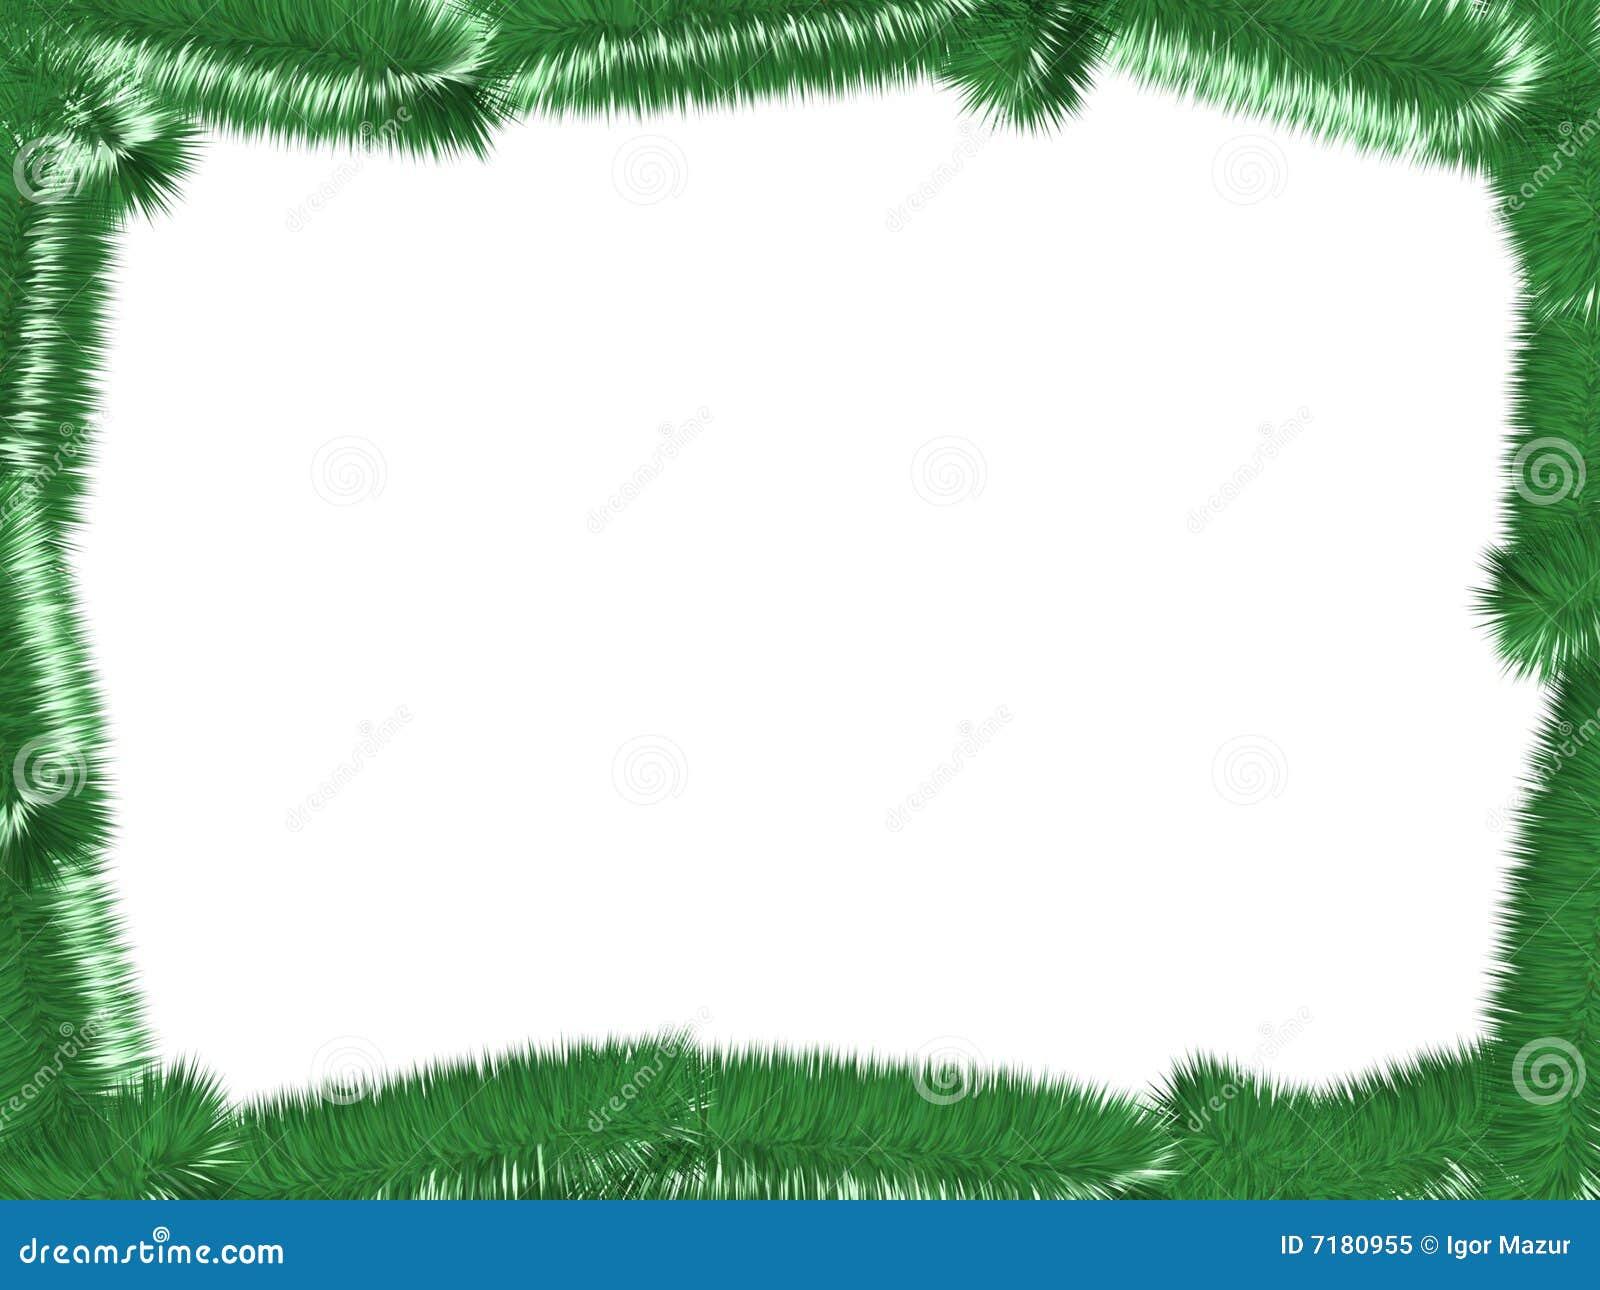 Christmas Tree Frame Royalty Free Stock Photo - Image: 7180955